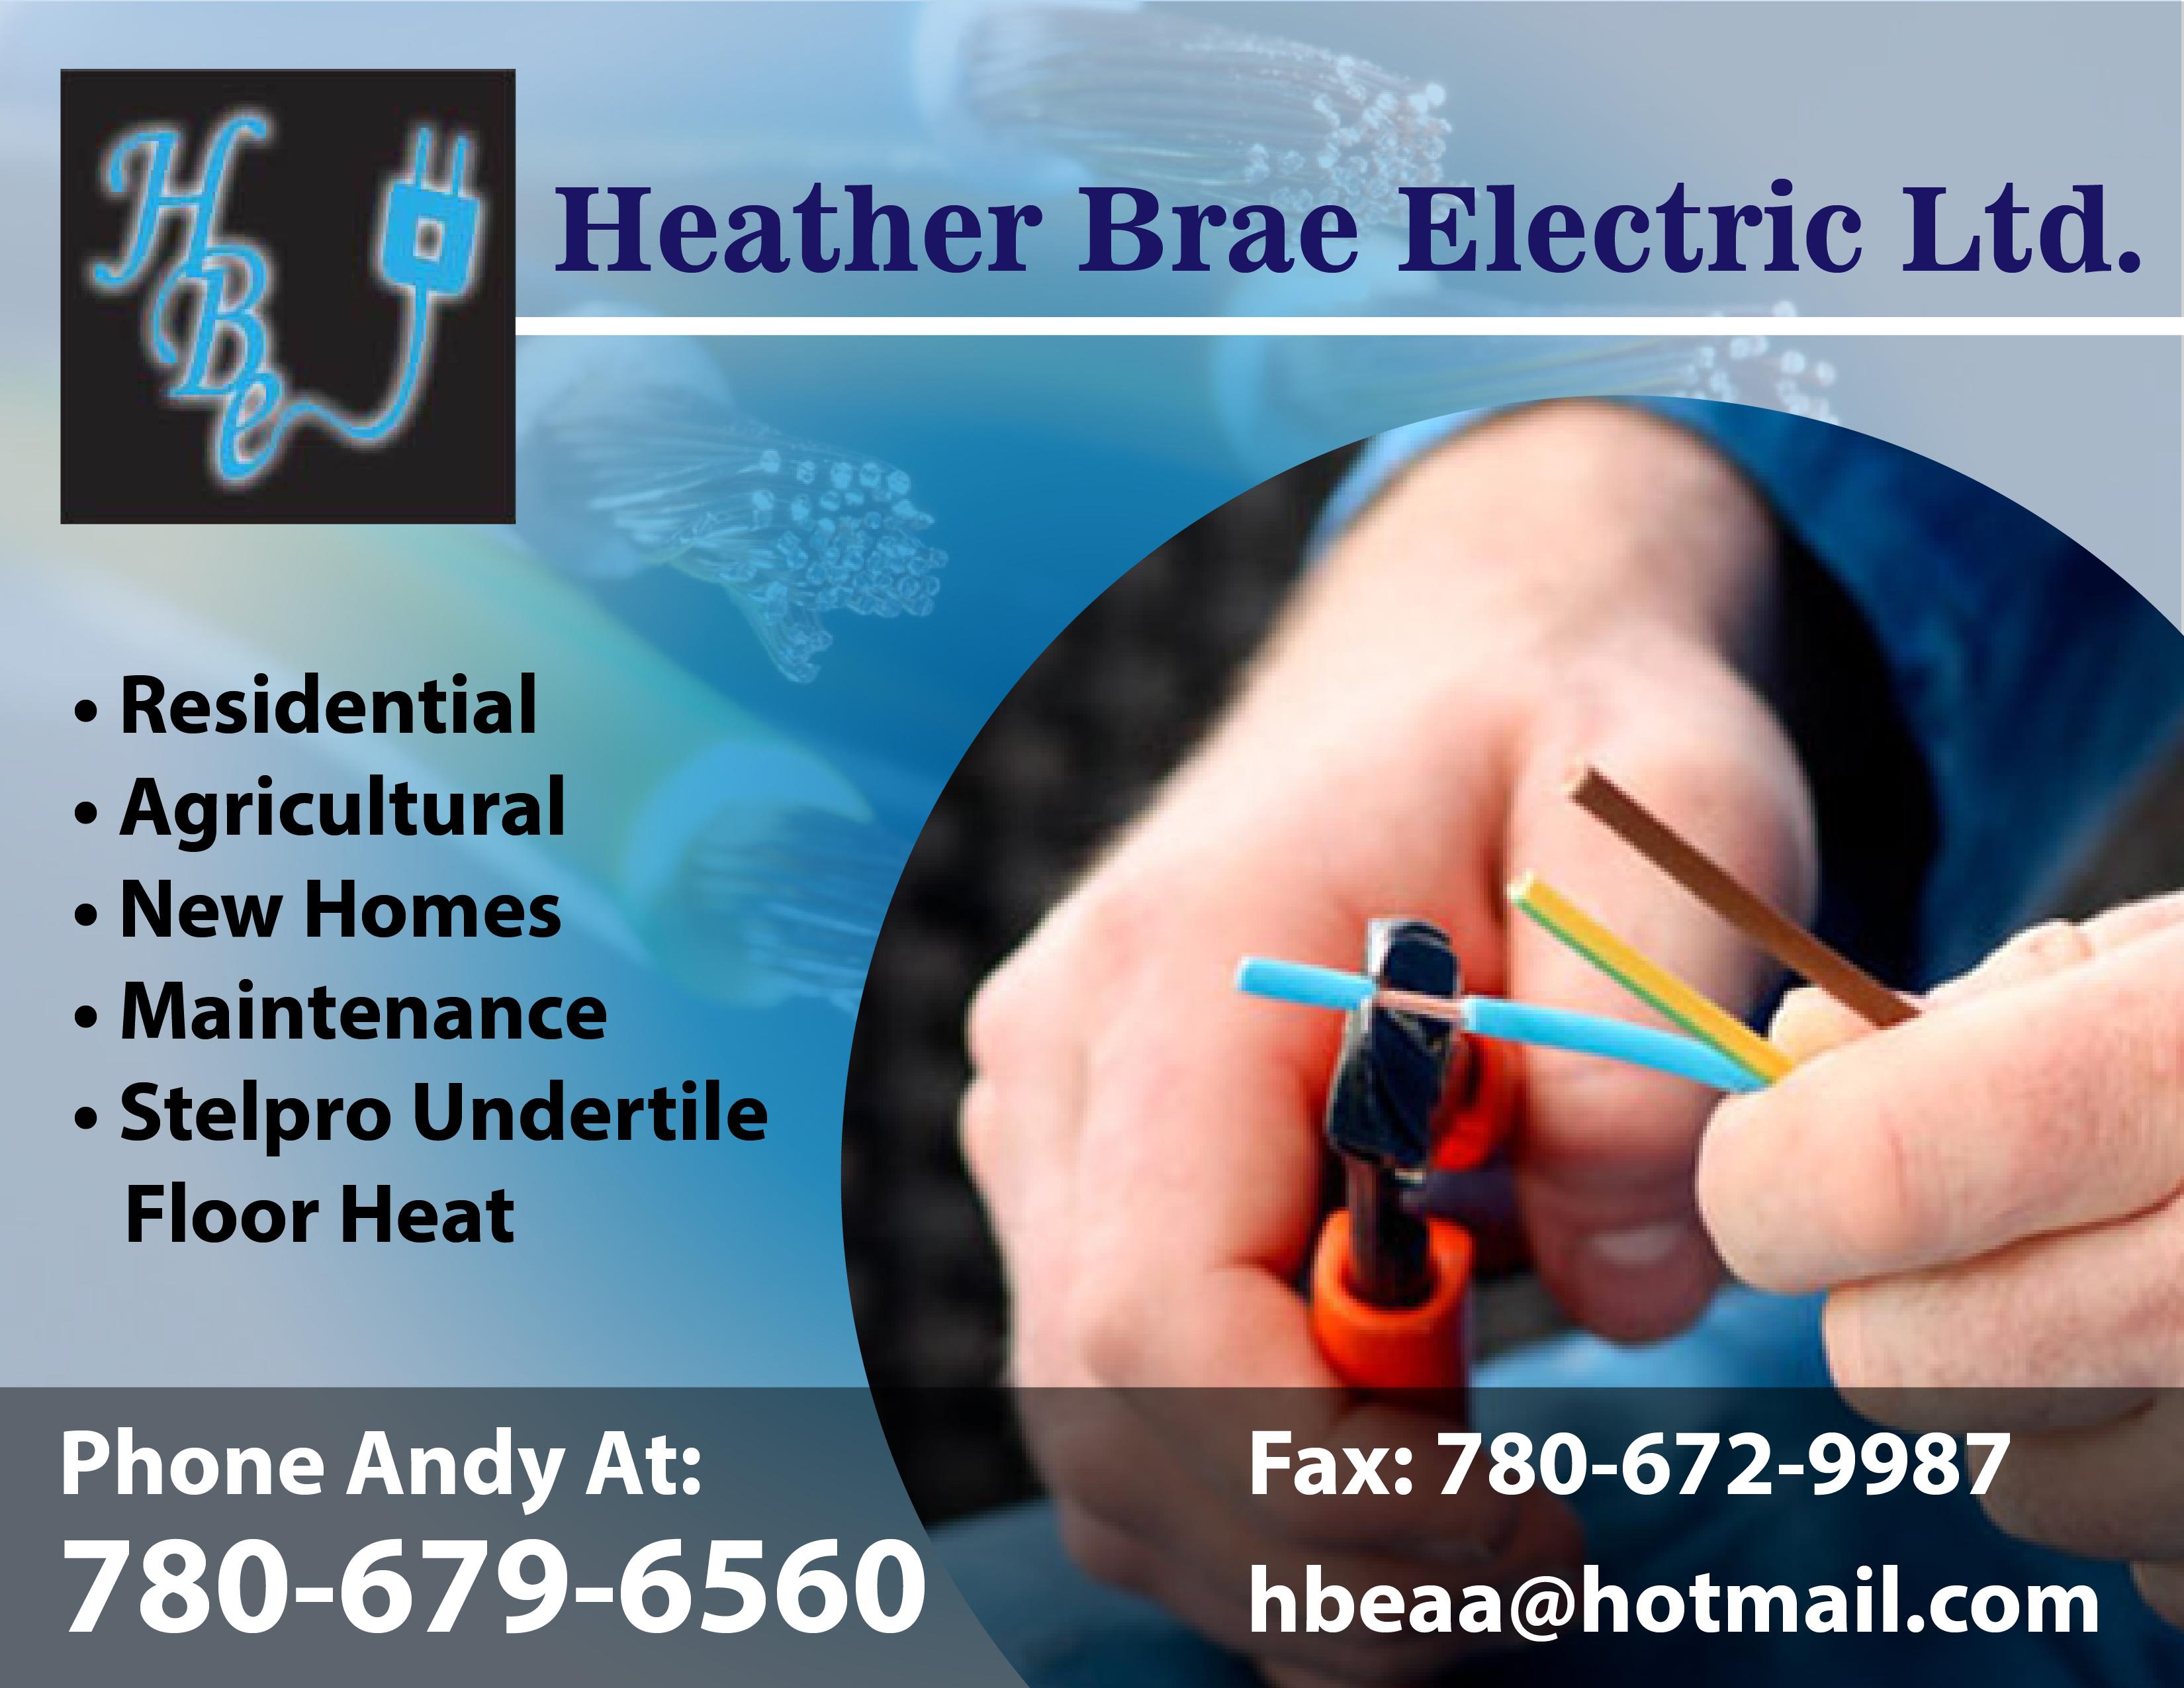 Heather Brae Electric Ltd.